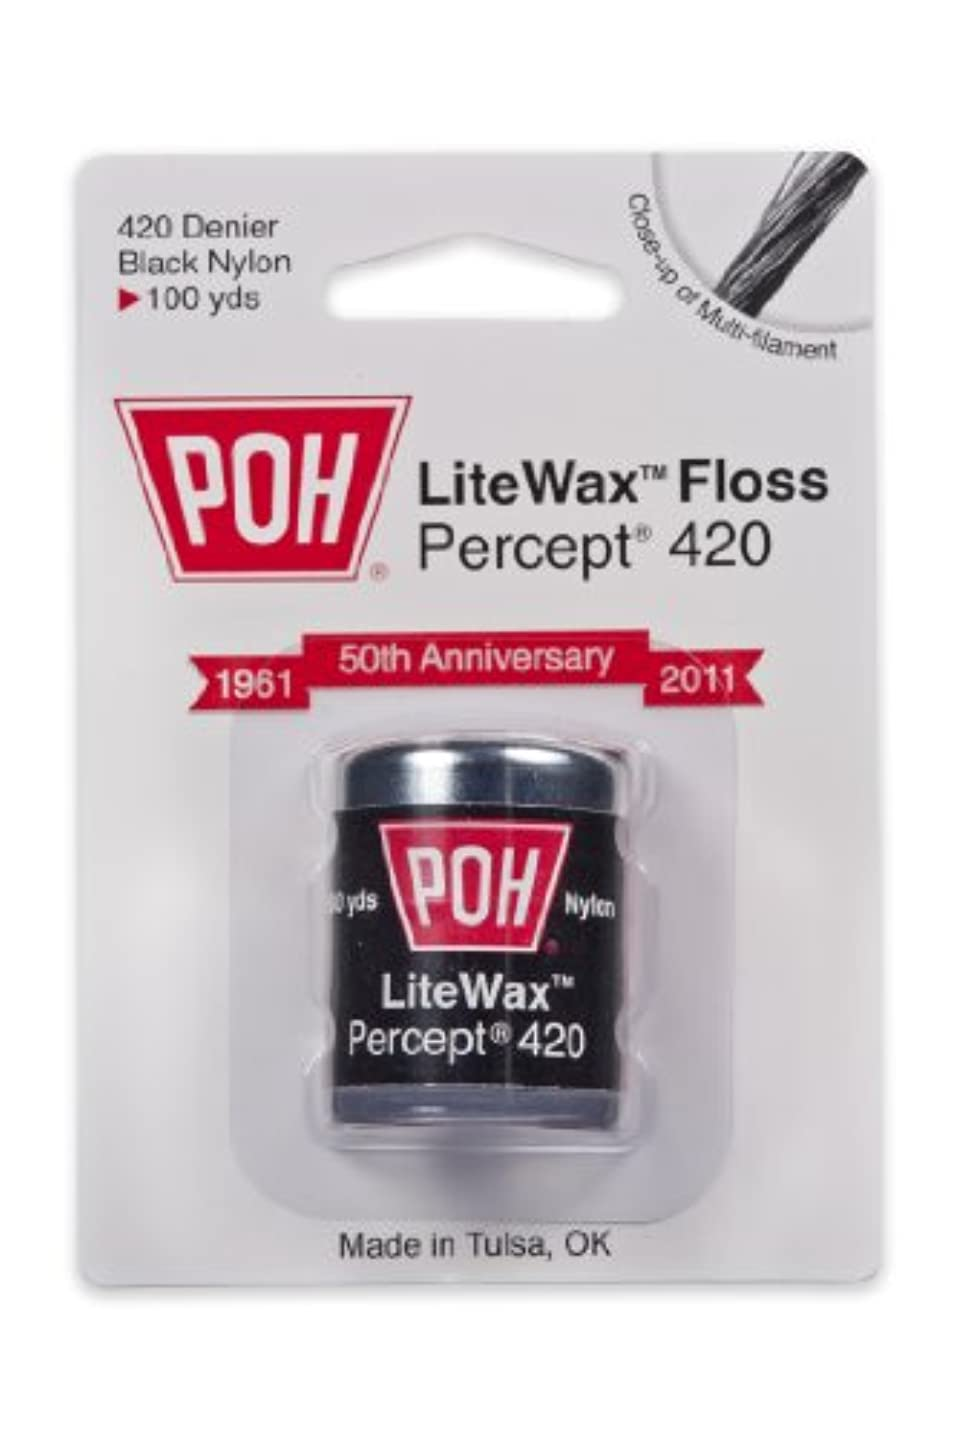 POH Dental Floss Percept 420 Black LiteWax 100 Yard